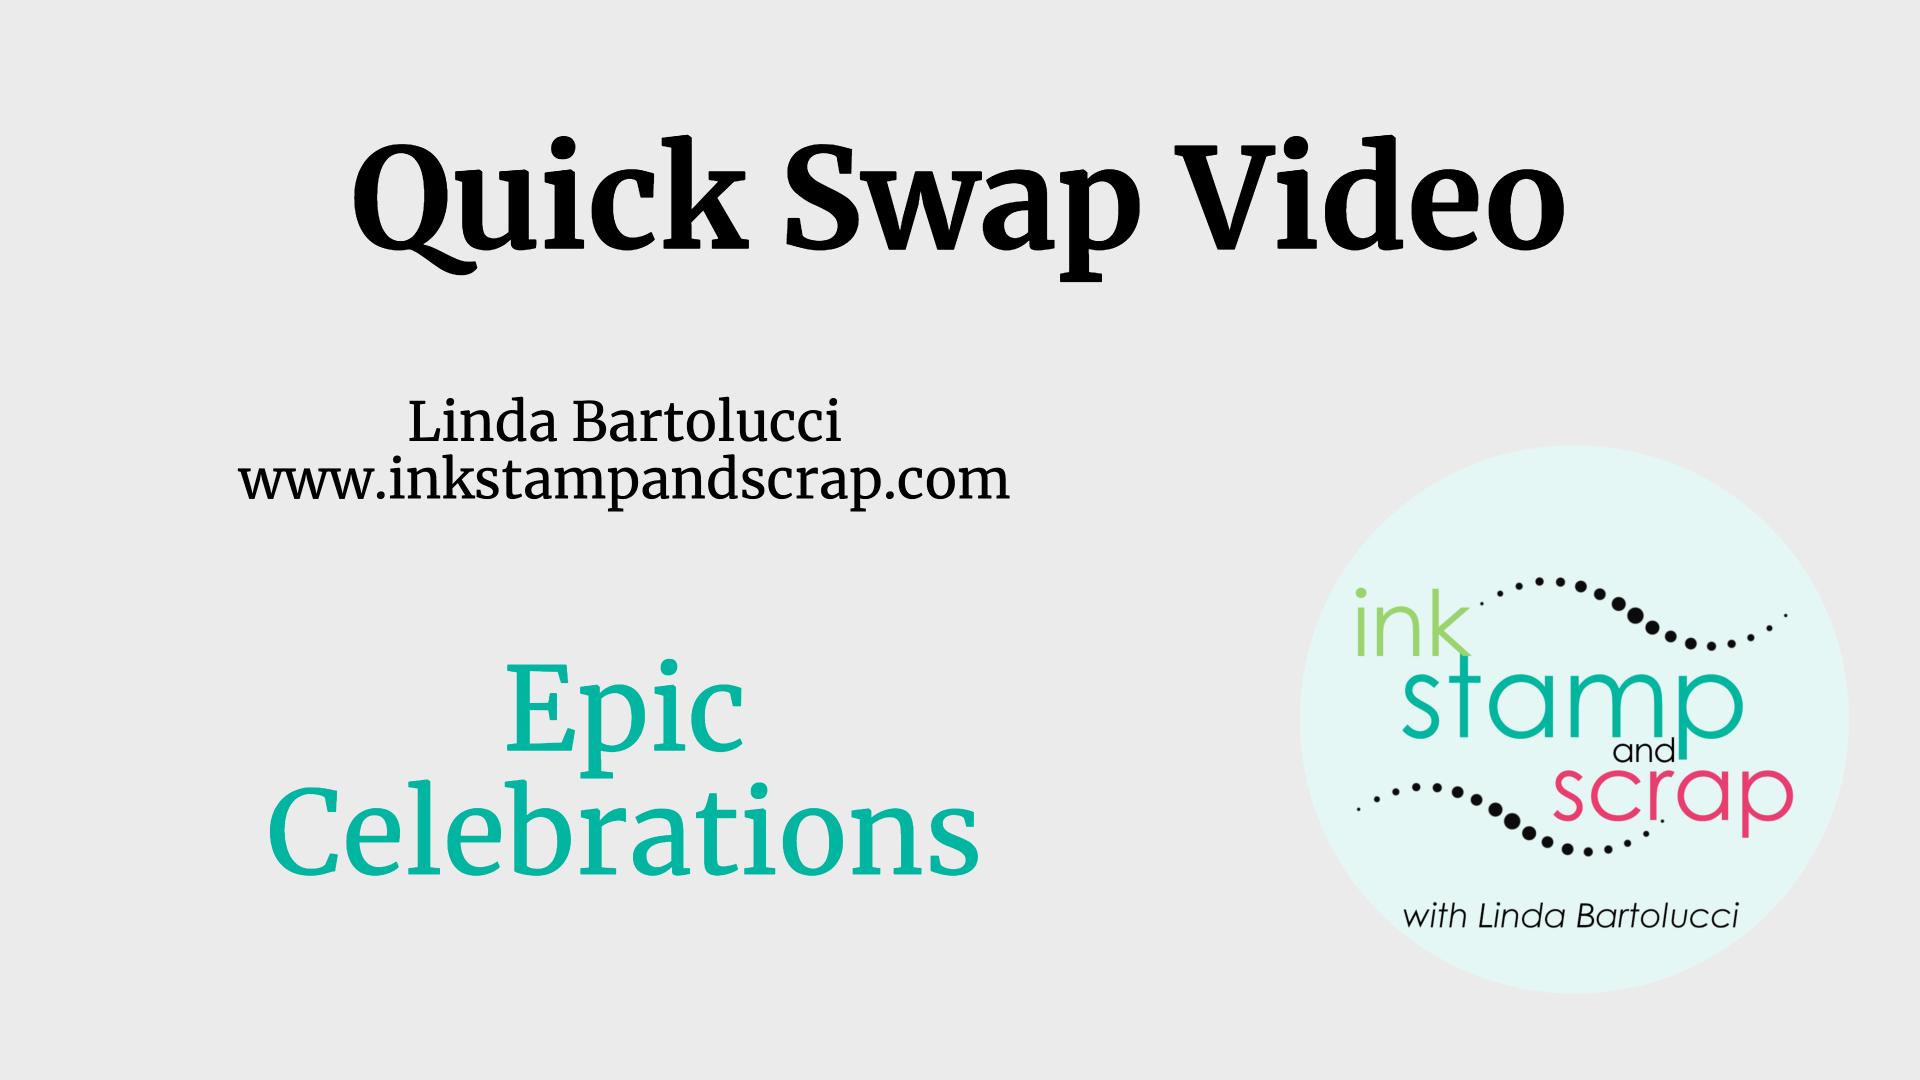 Quick Swap Video Epic Celebrations